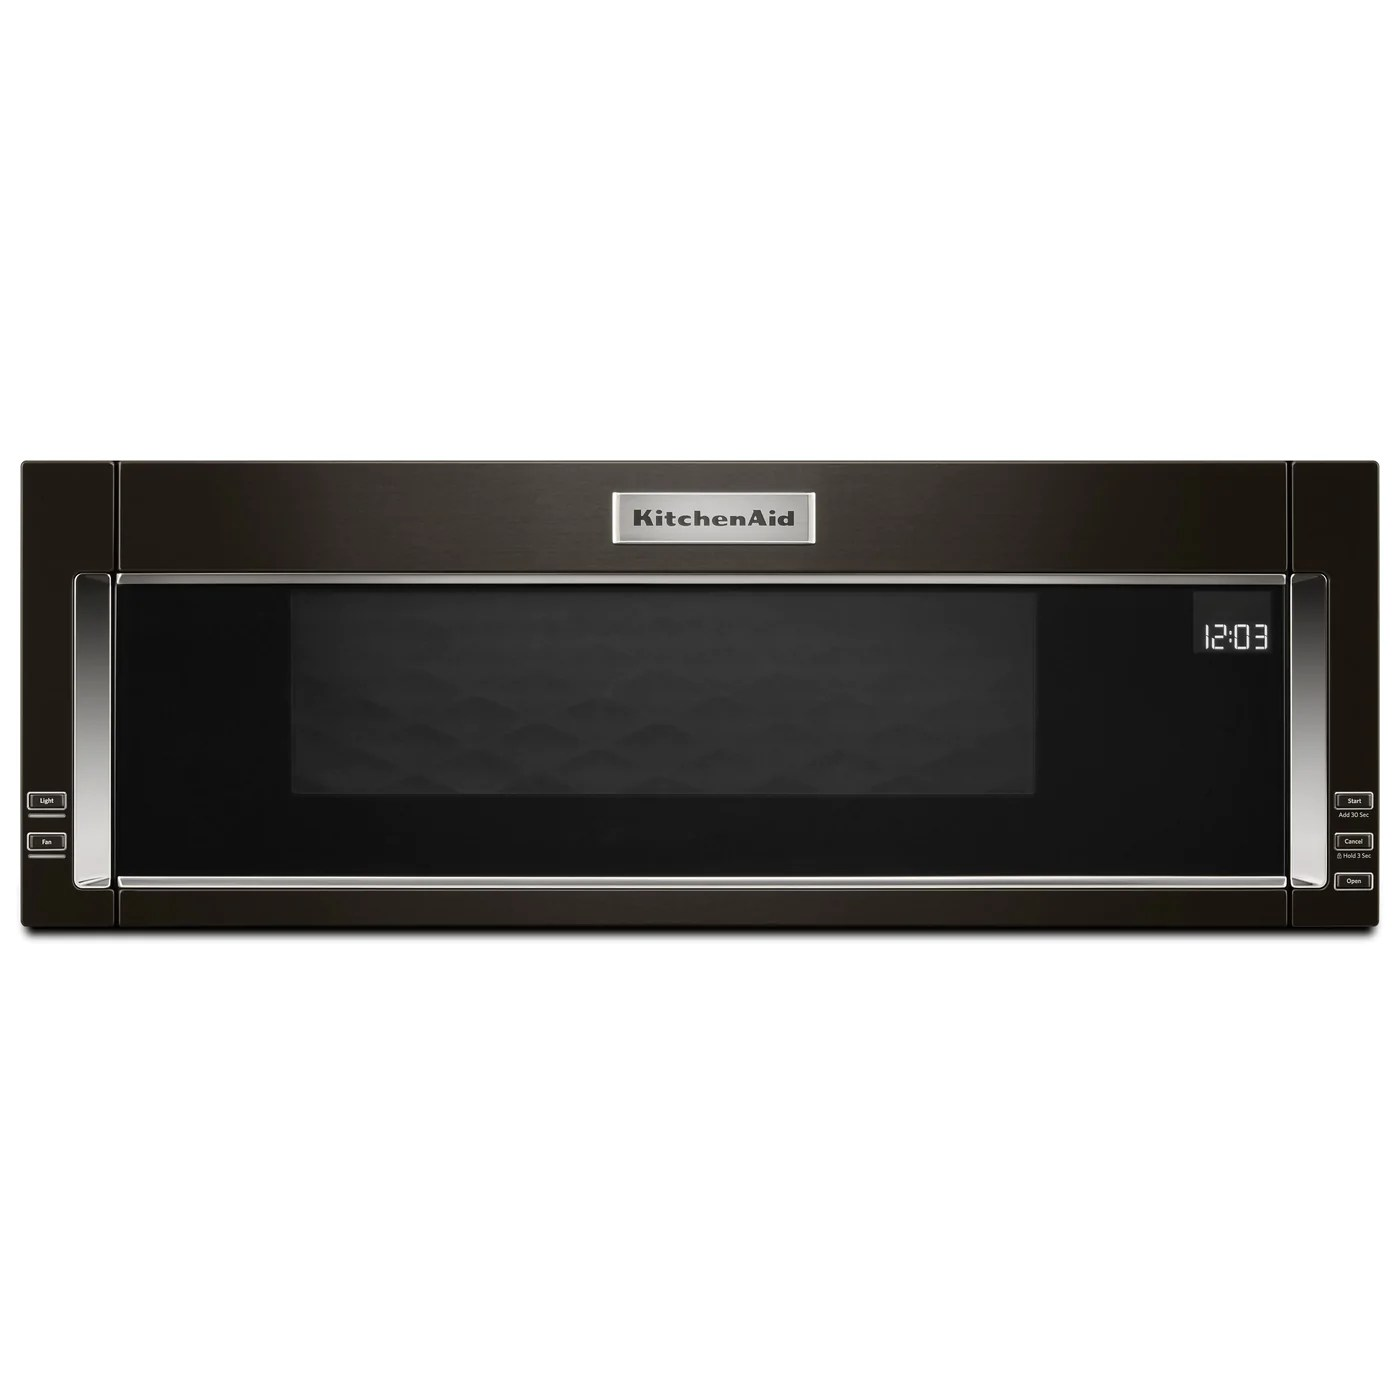 kitchenaid 1 1 cu ft low profile microwave hood combination ykmls311hbs